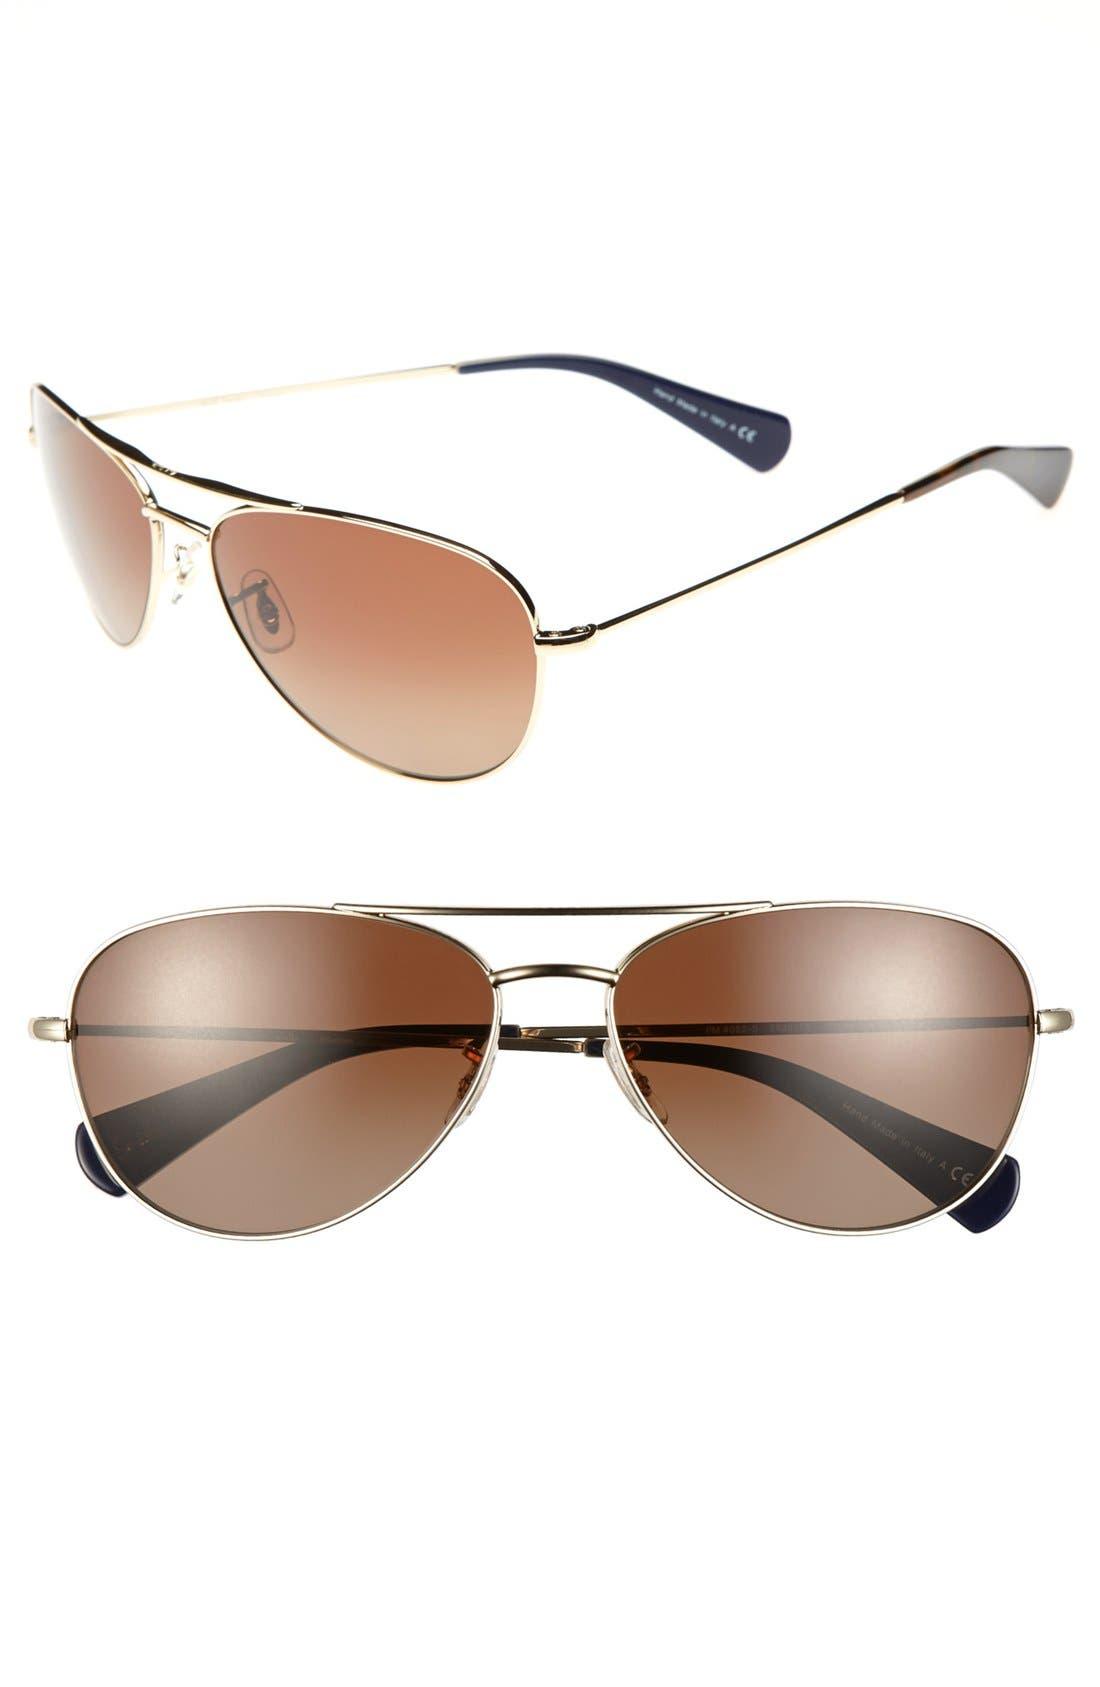 Alternate Image 1 Selected - Paul Smith 'Orsett' 61mm Polarized Sunglasses